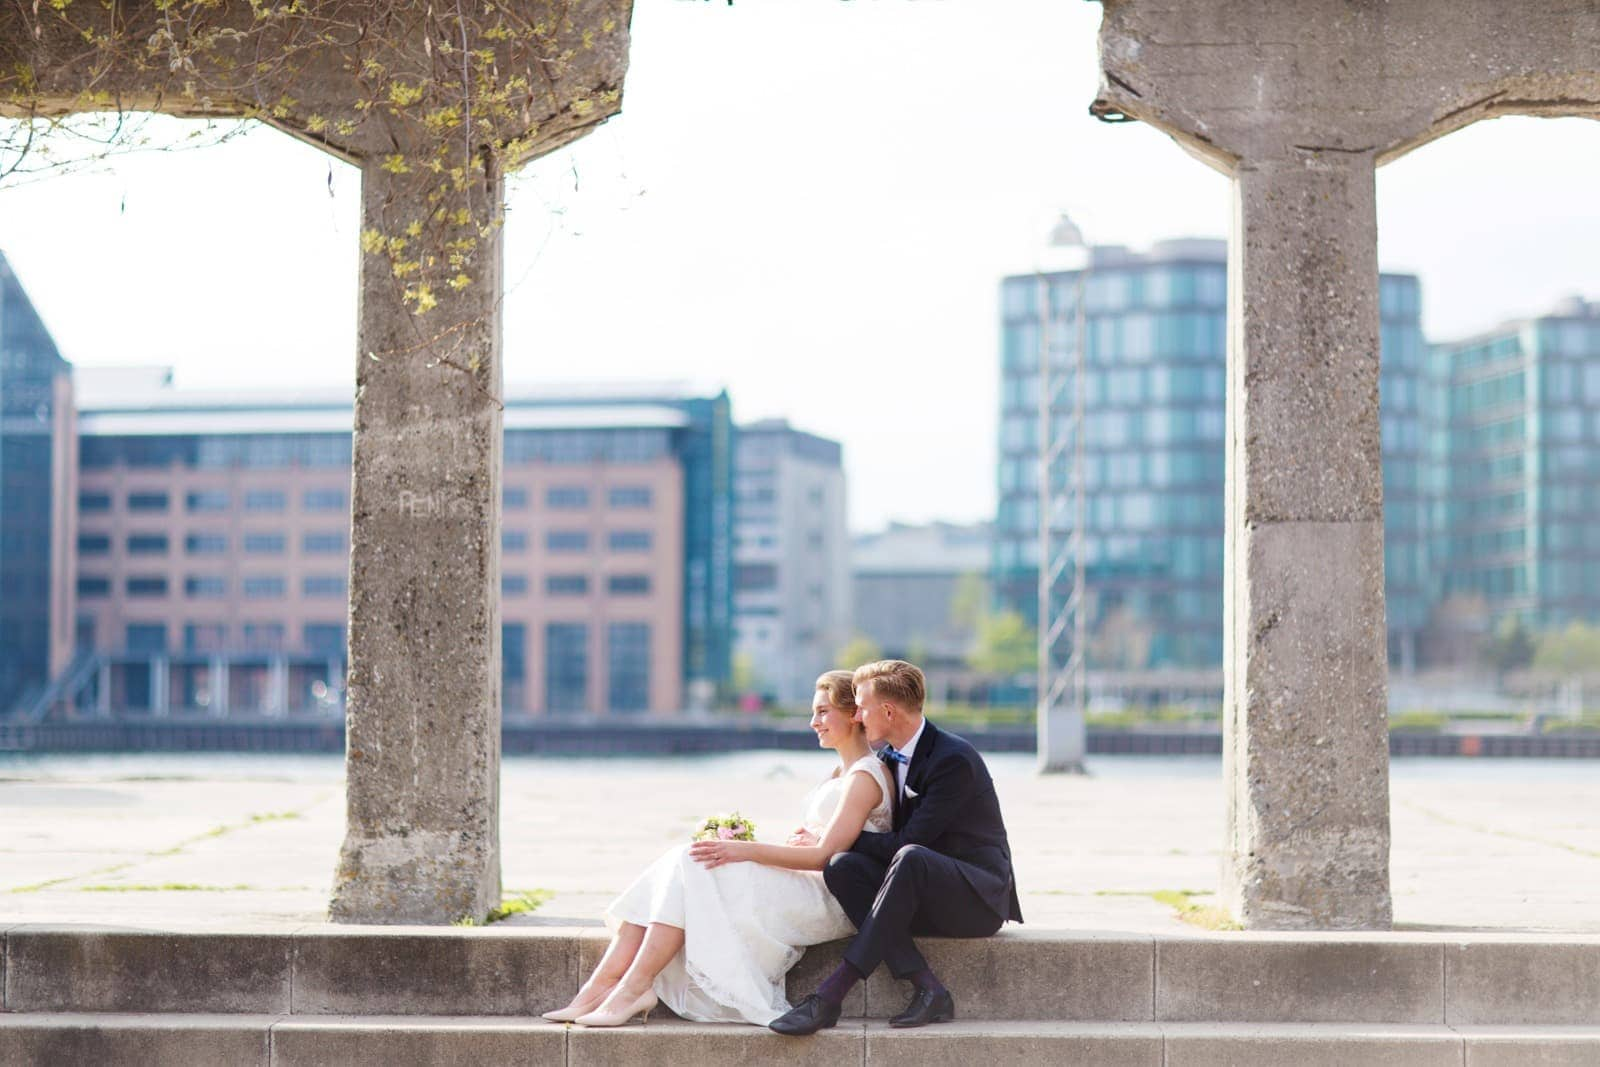 Islandsbrygge – Location til bryllup